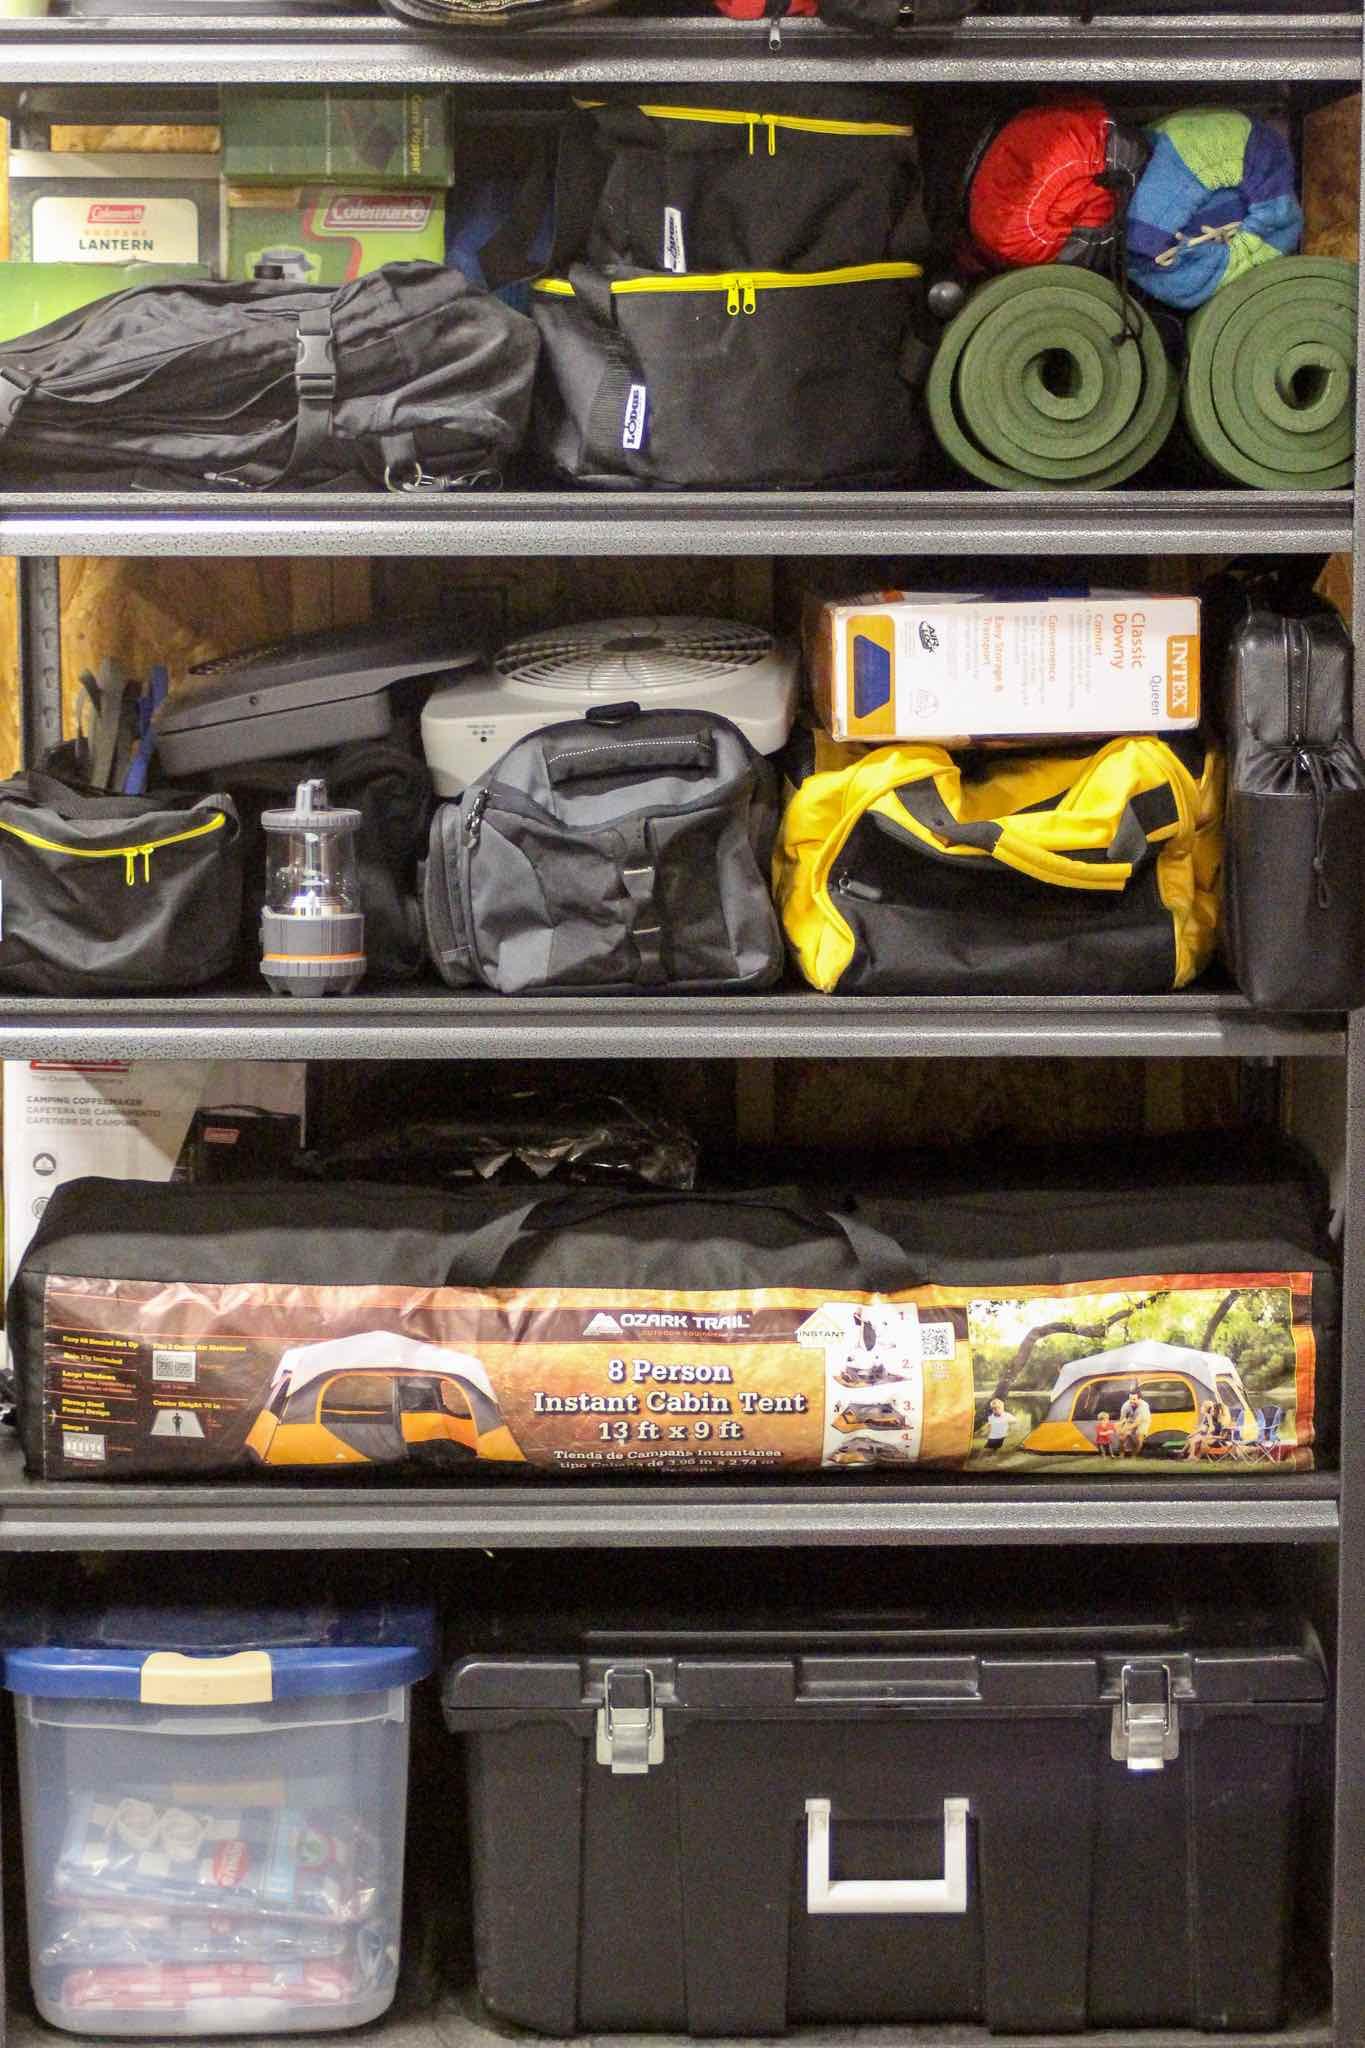 stored car camping gear